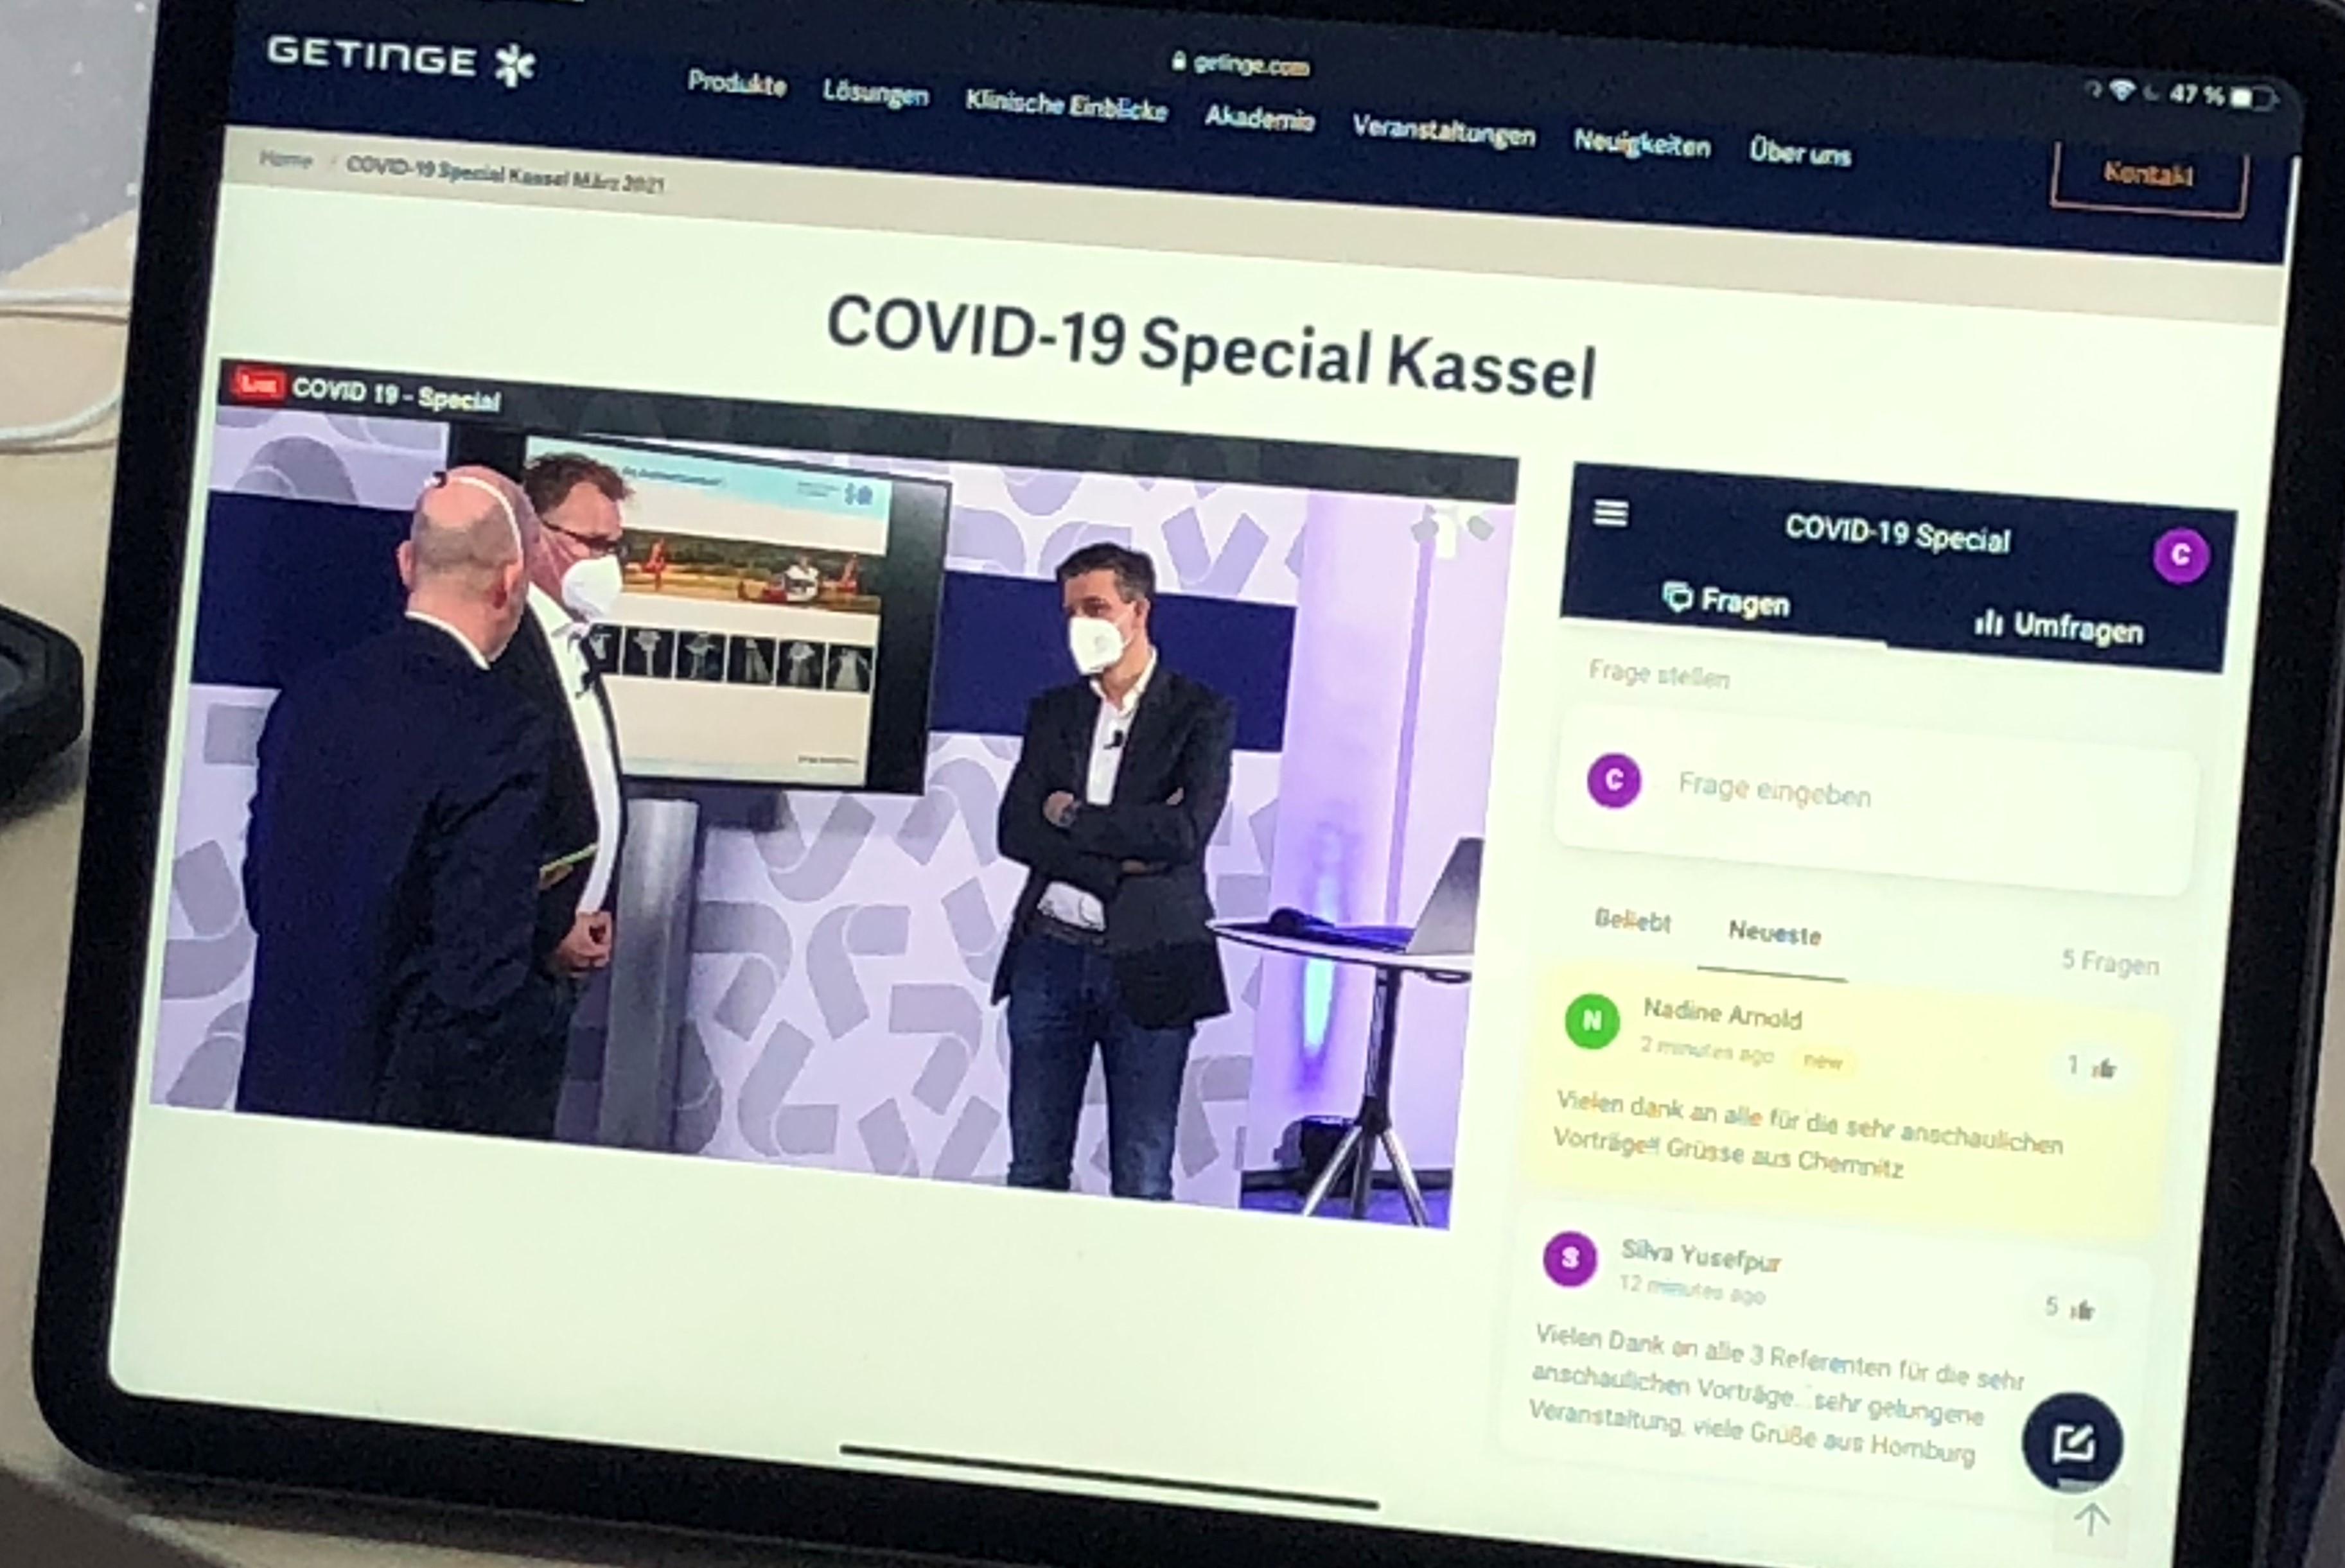 COVID-19 Special - Videoaufzeichnung